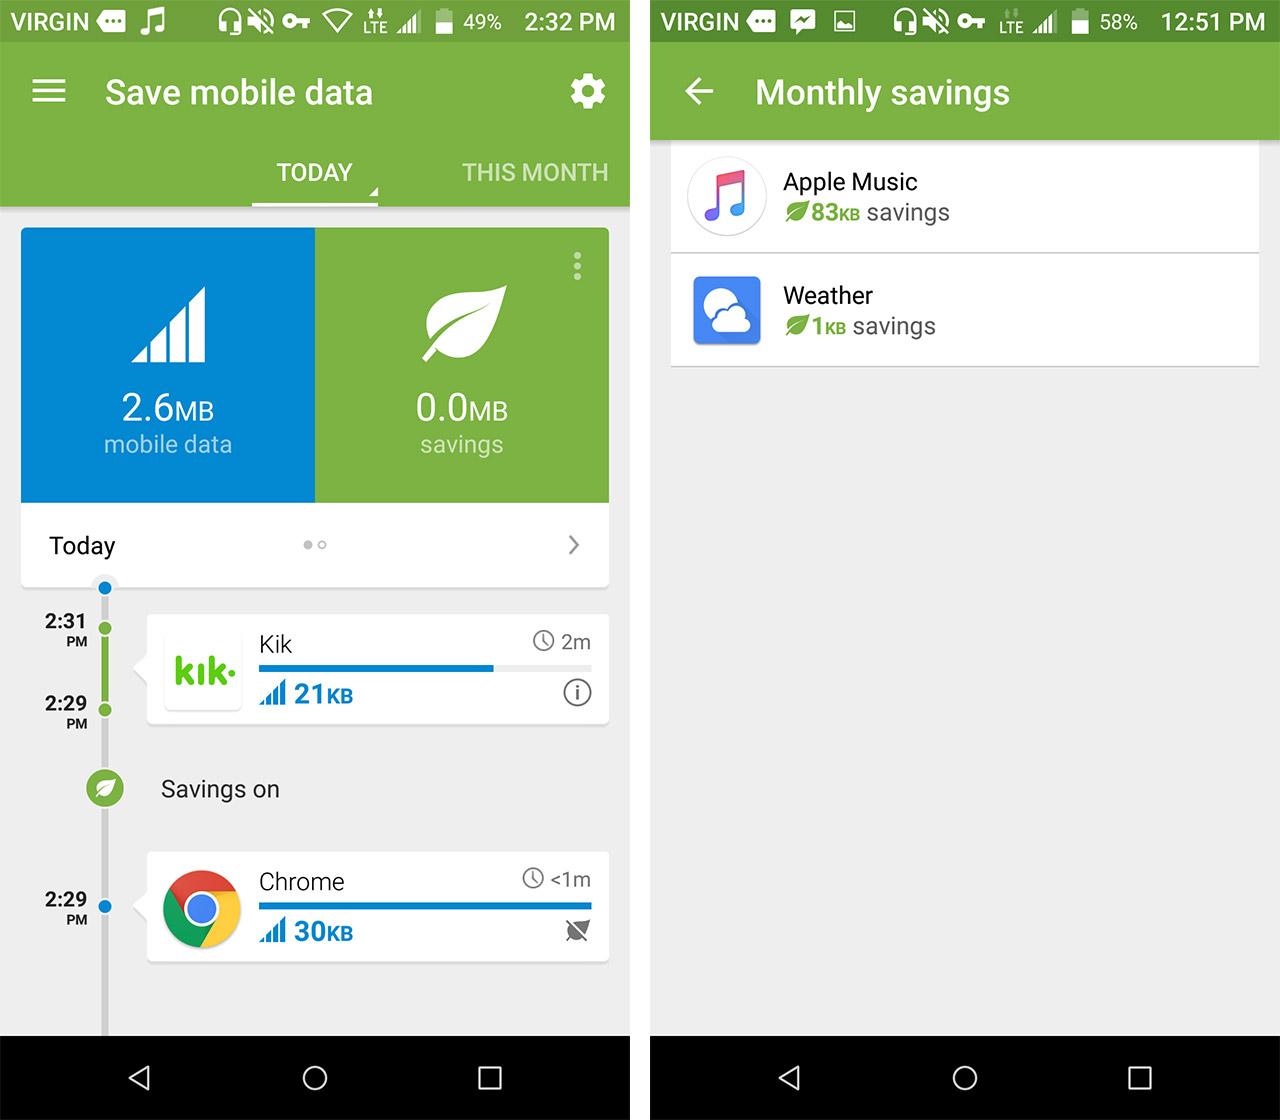 opera max screen shots - save data